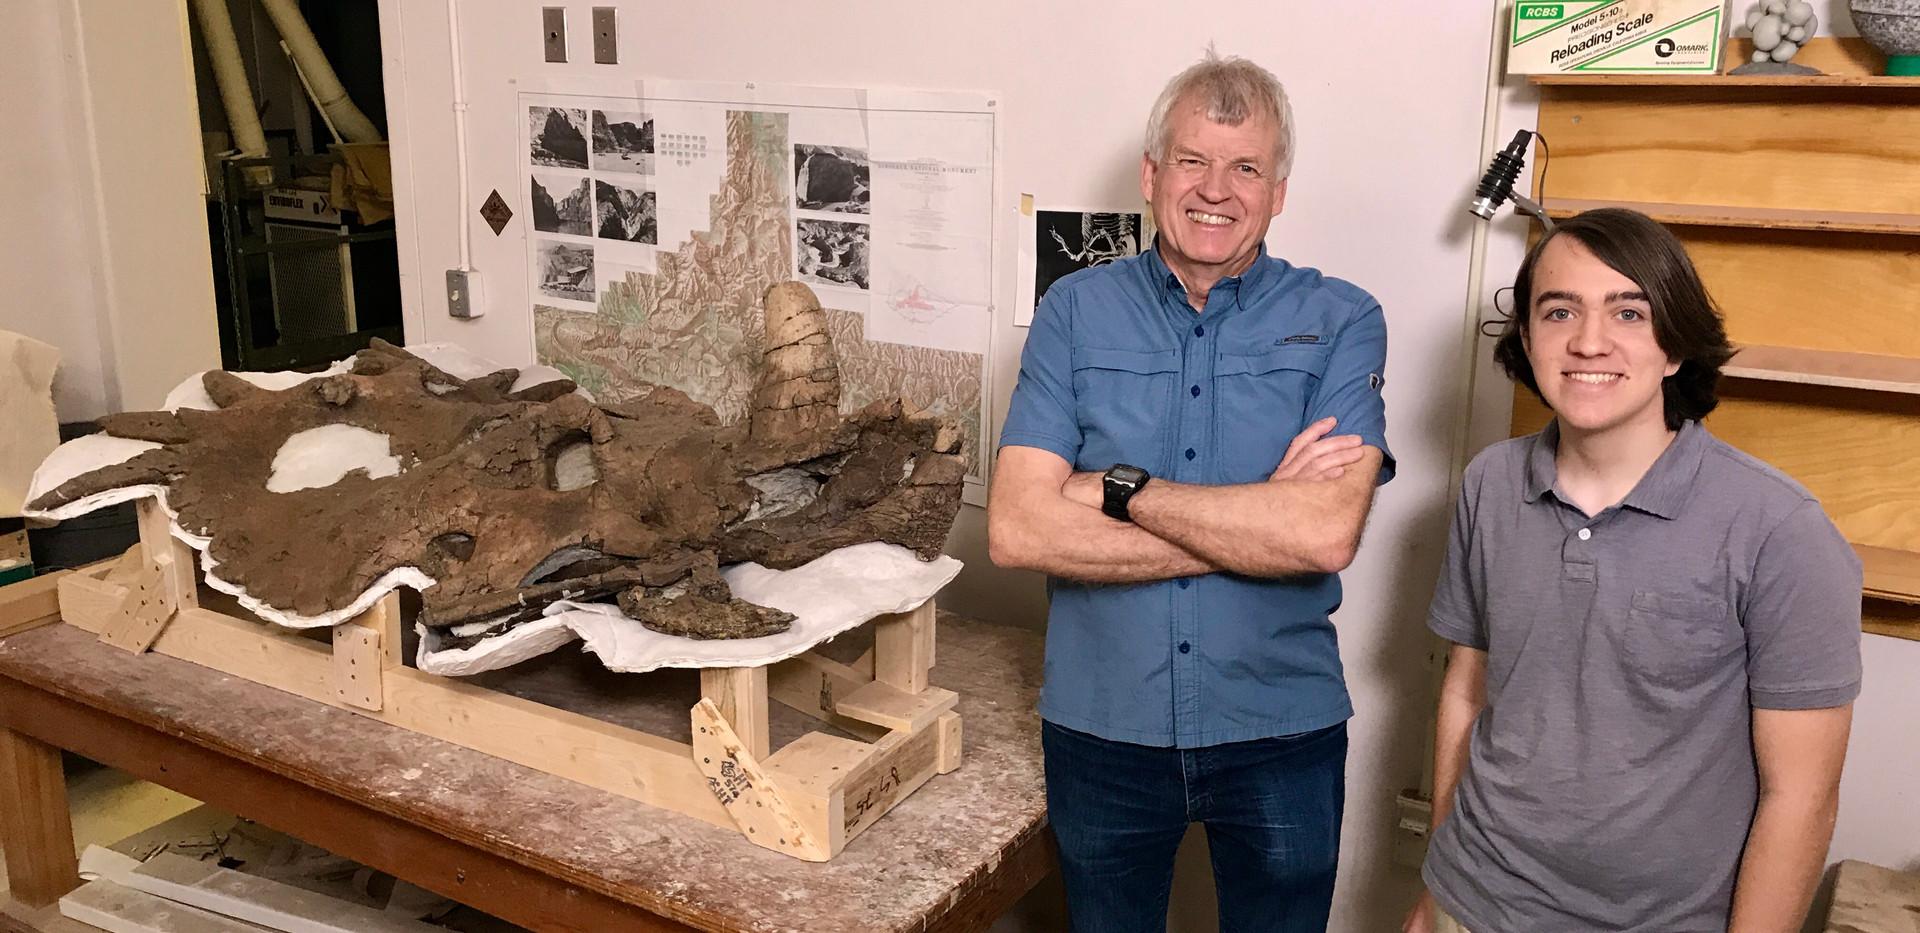 Paleontologist Phil Currie